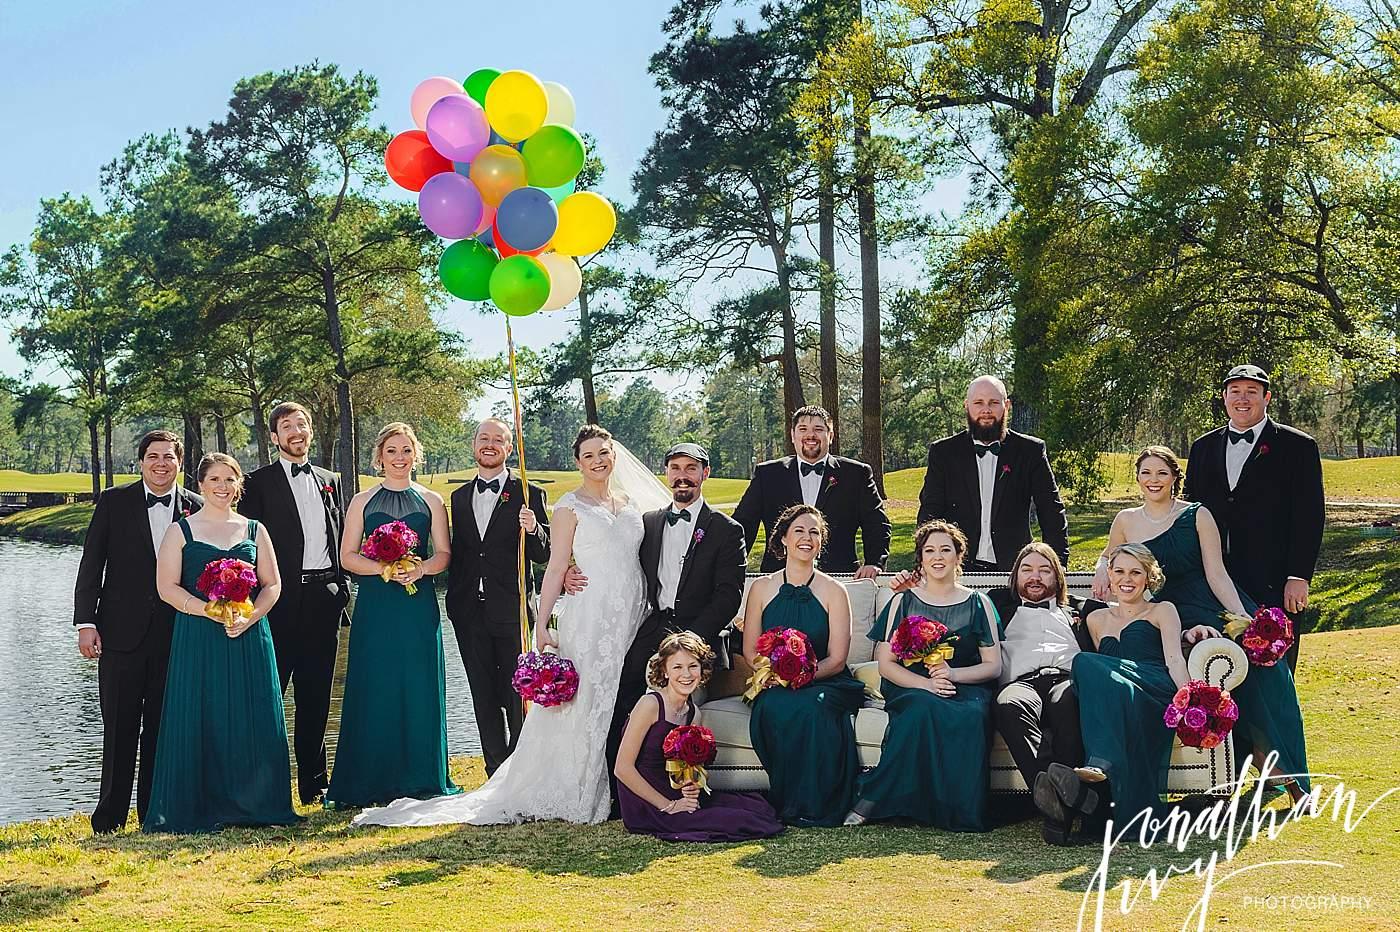 Up Themed Wedding Balloons